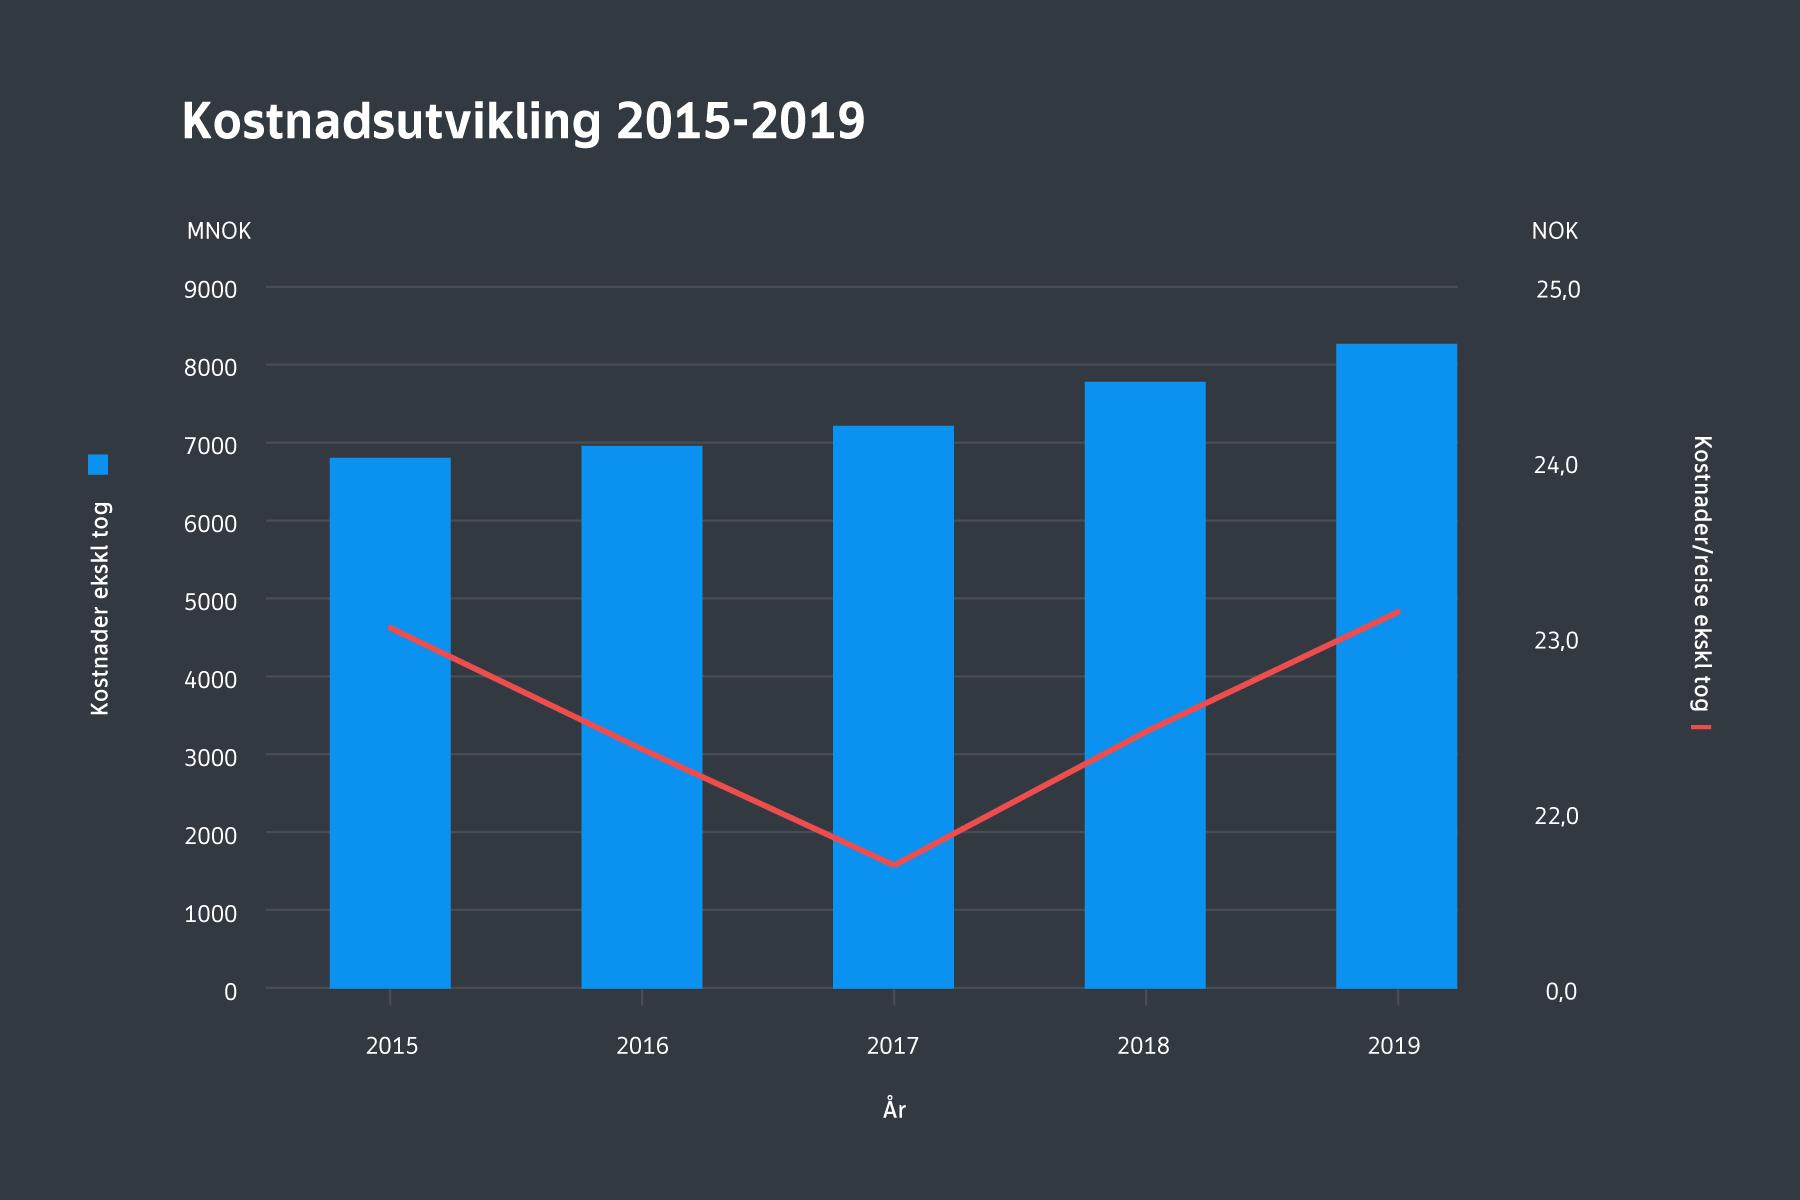 Kostnadsuviklingen mellom 2015 til 2019